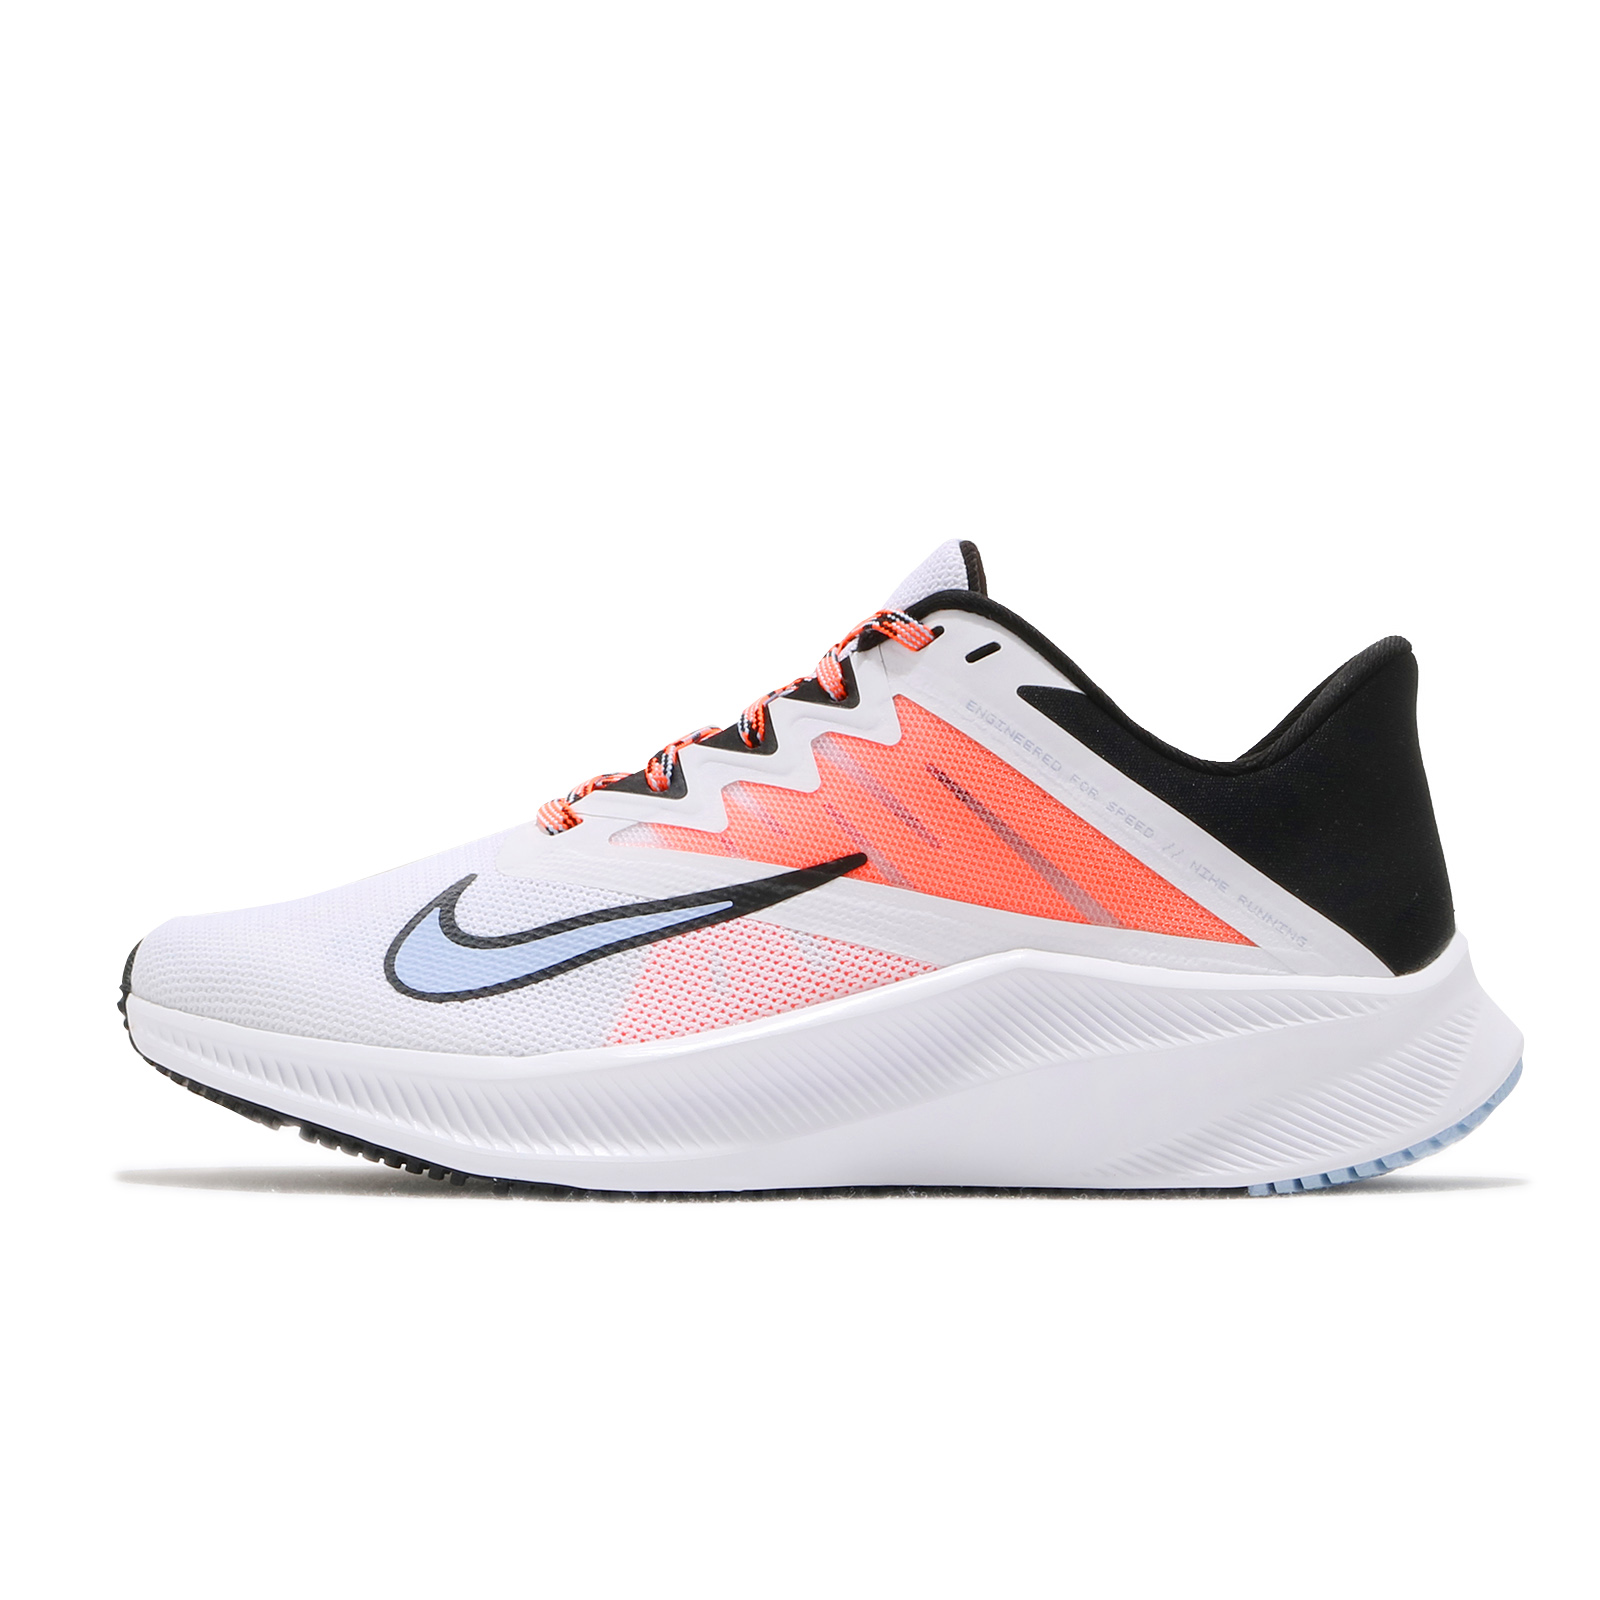 Nike 慢跑鞋 Wmns Quest 3 白 橘 藍 女鞋 路跑 運動鞋 【ACS】 CD0232-101